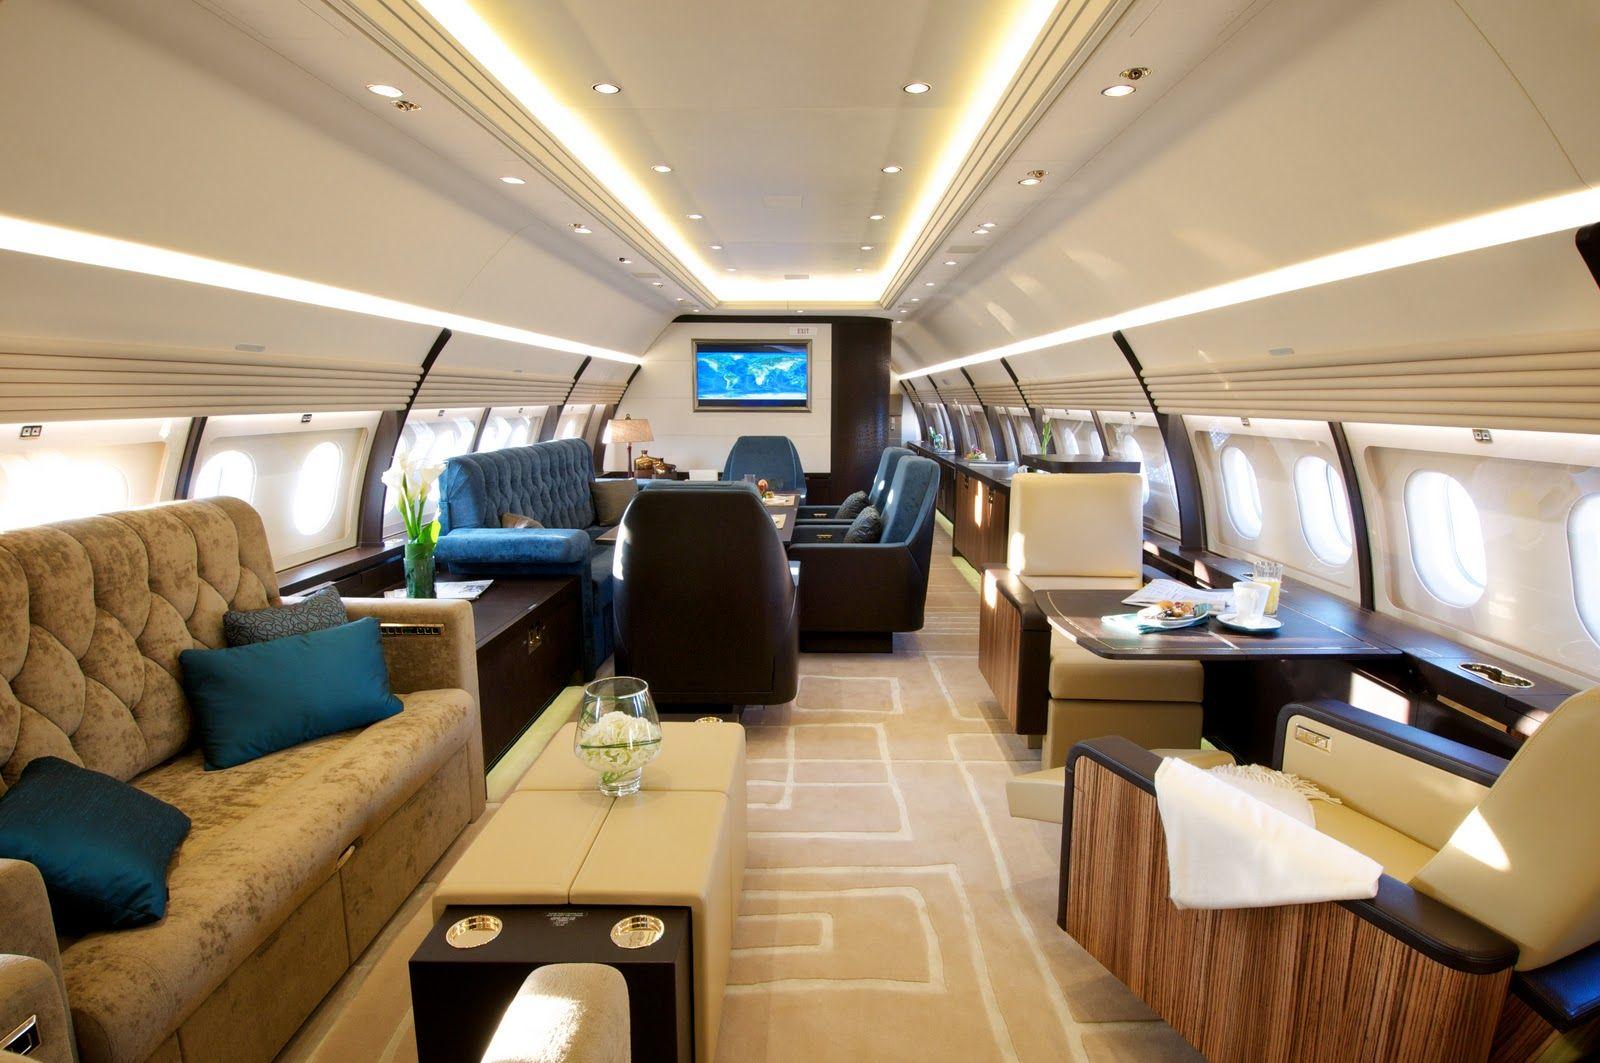 Luxury Jet Interior Images